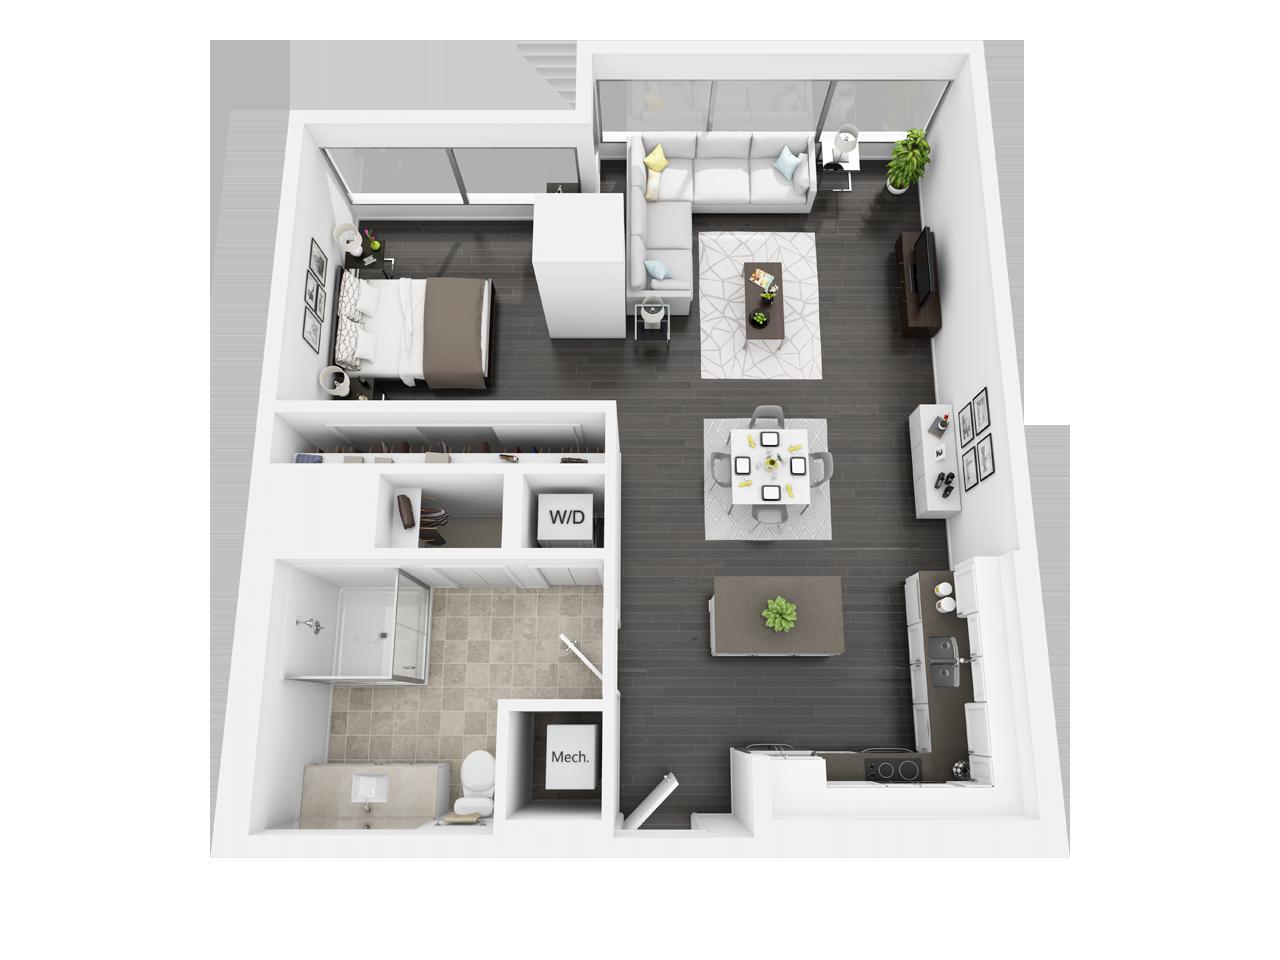 E3 1 Bedroom 1 Bath Floor Plan In 2020 Loft Apartment Dream Apartment Floor Plans